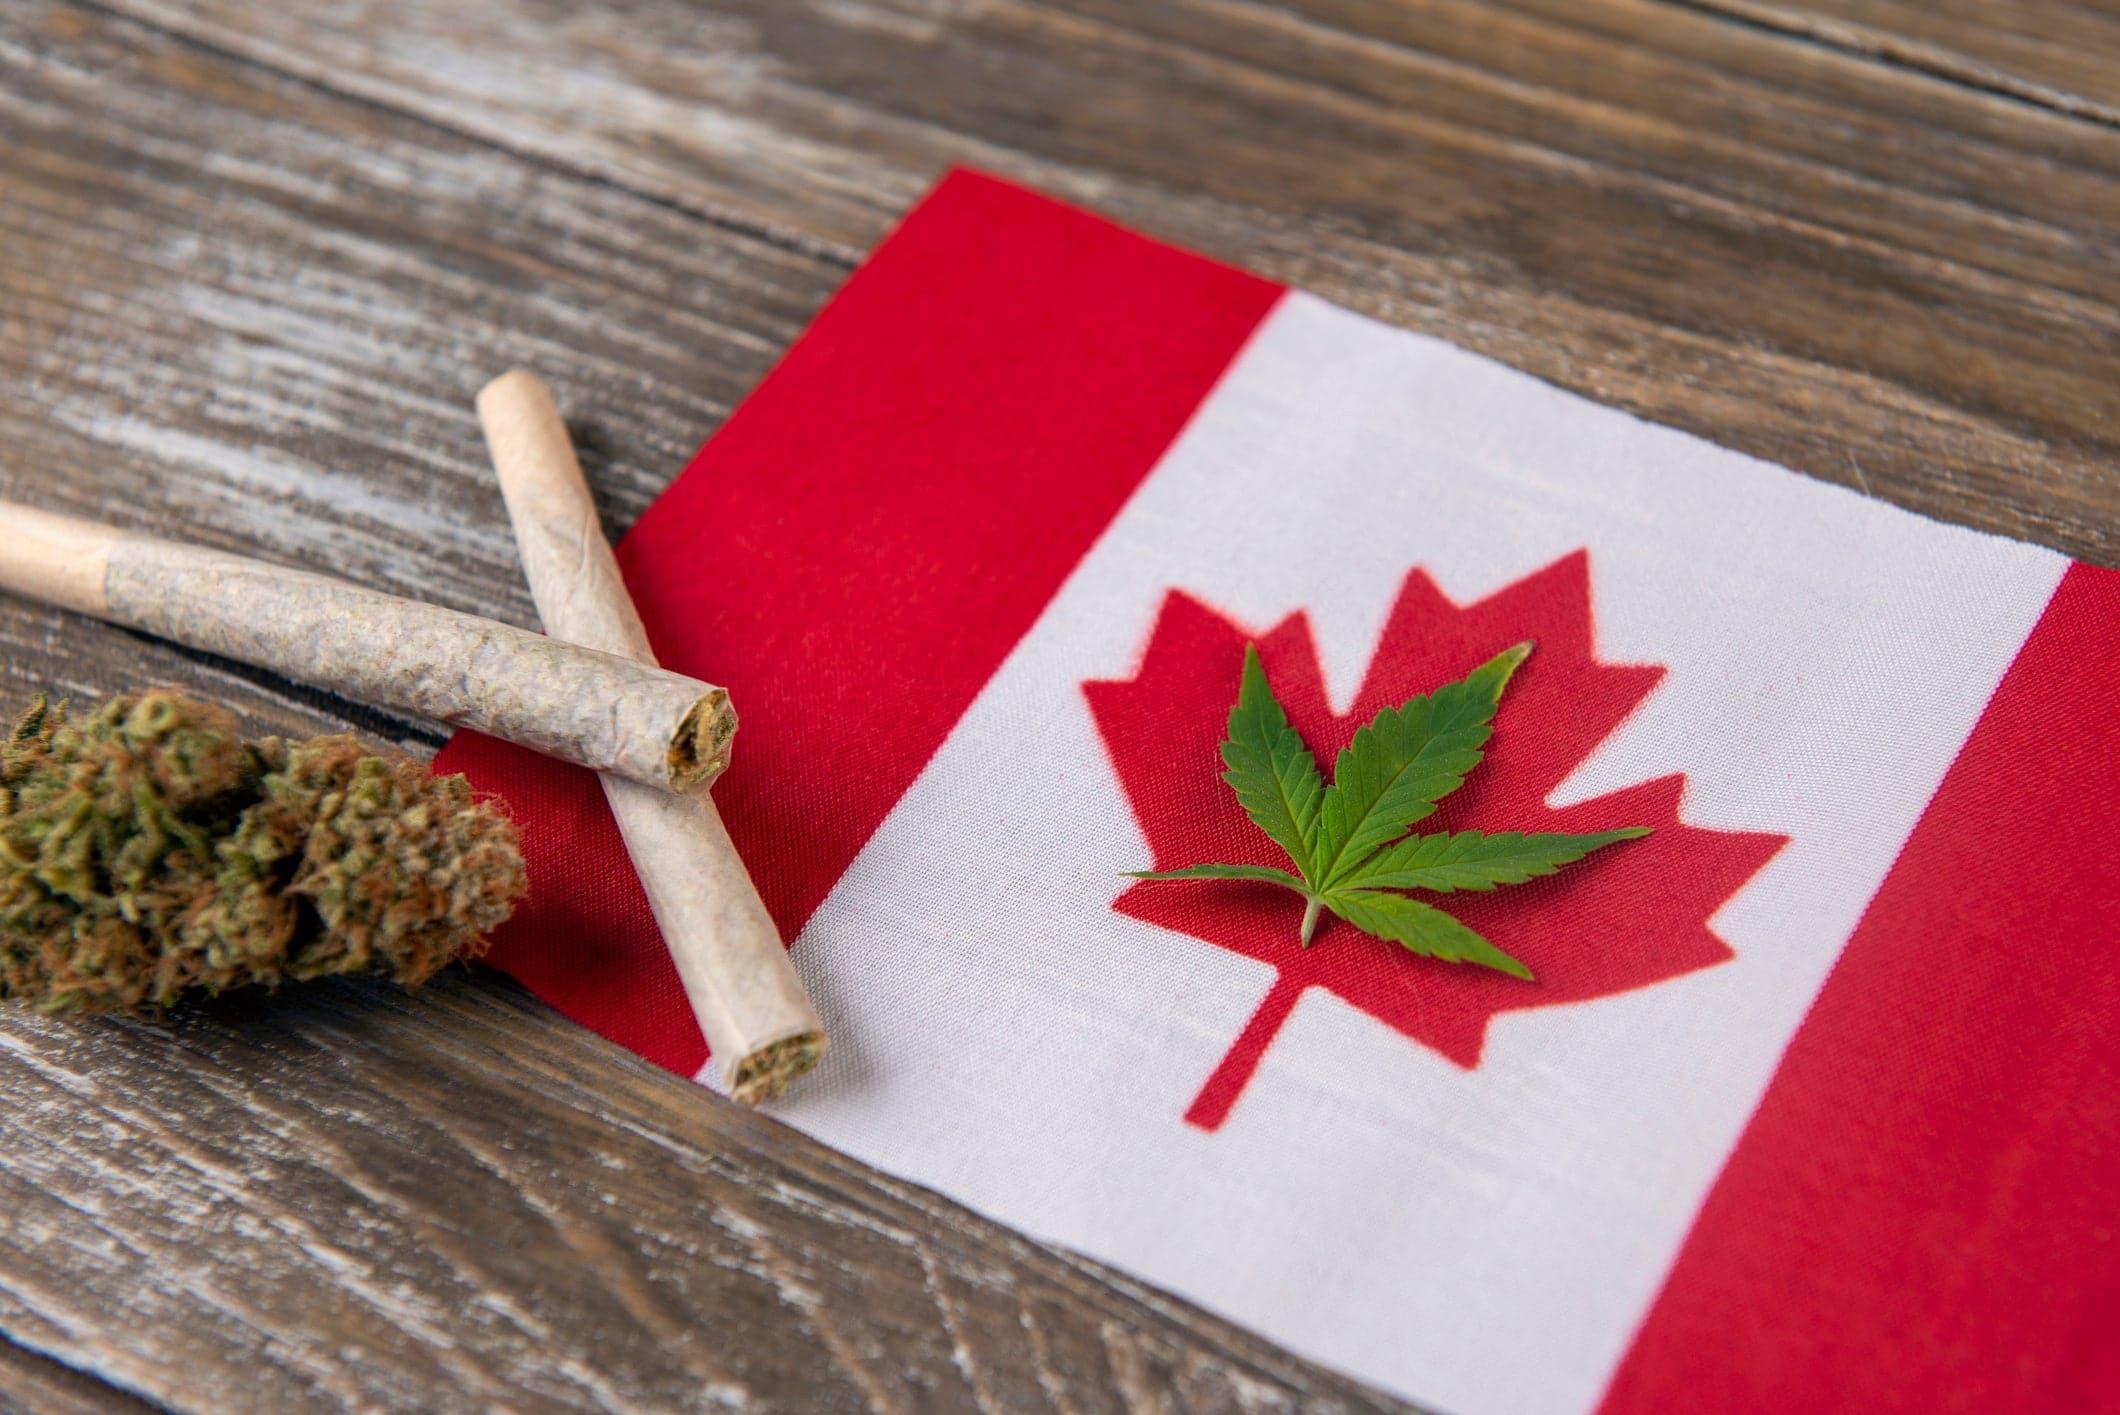 Maconha no Canadá